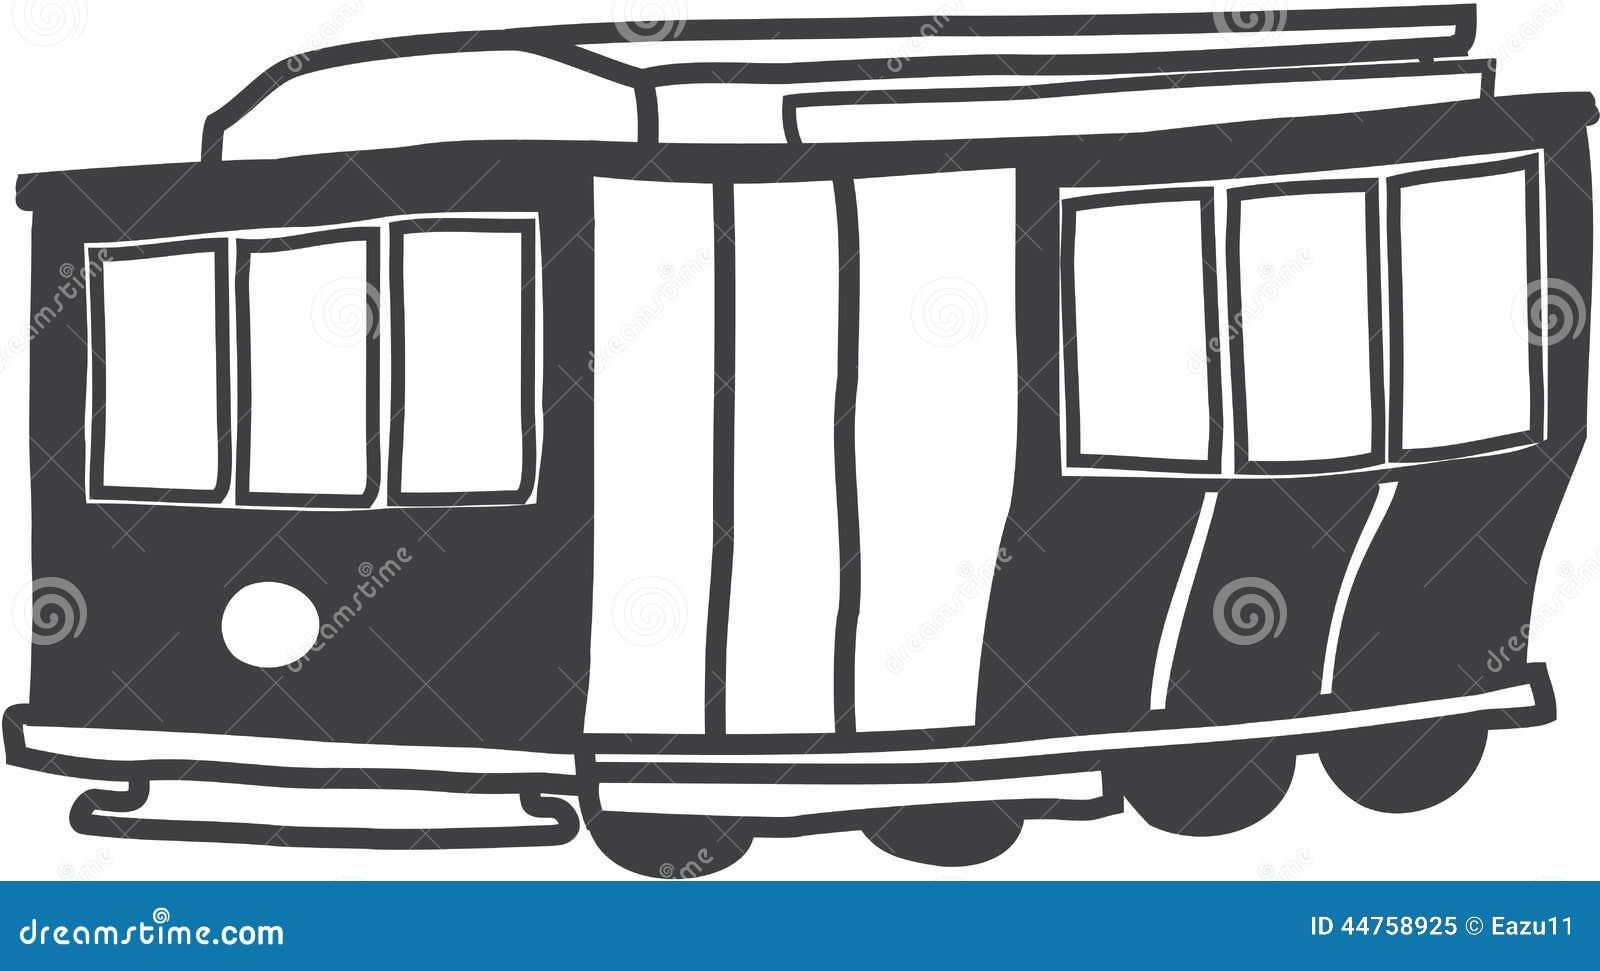 San Francisco Cable Car Drawing Stock Illustration - Illustration of ...